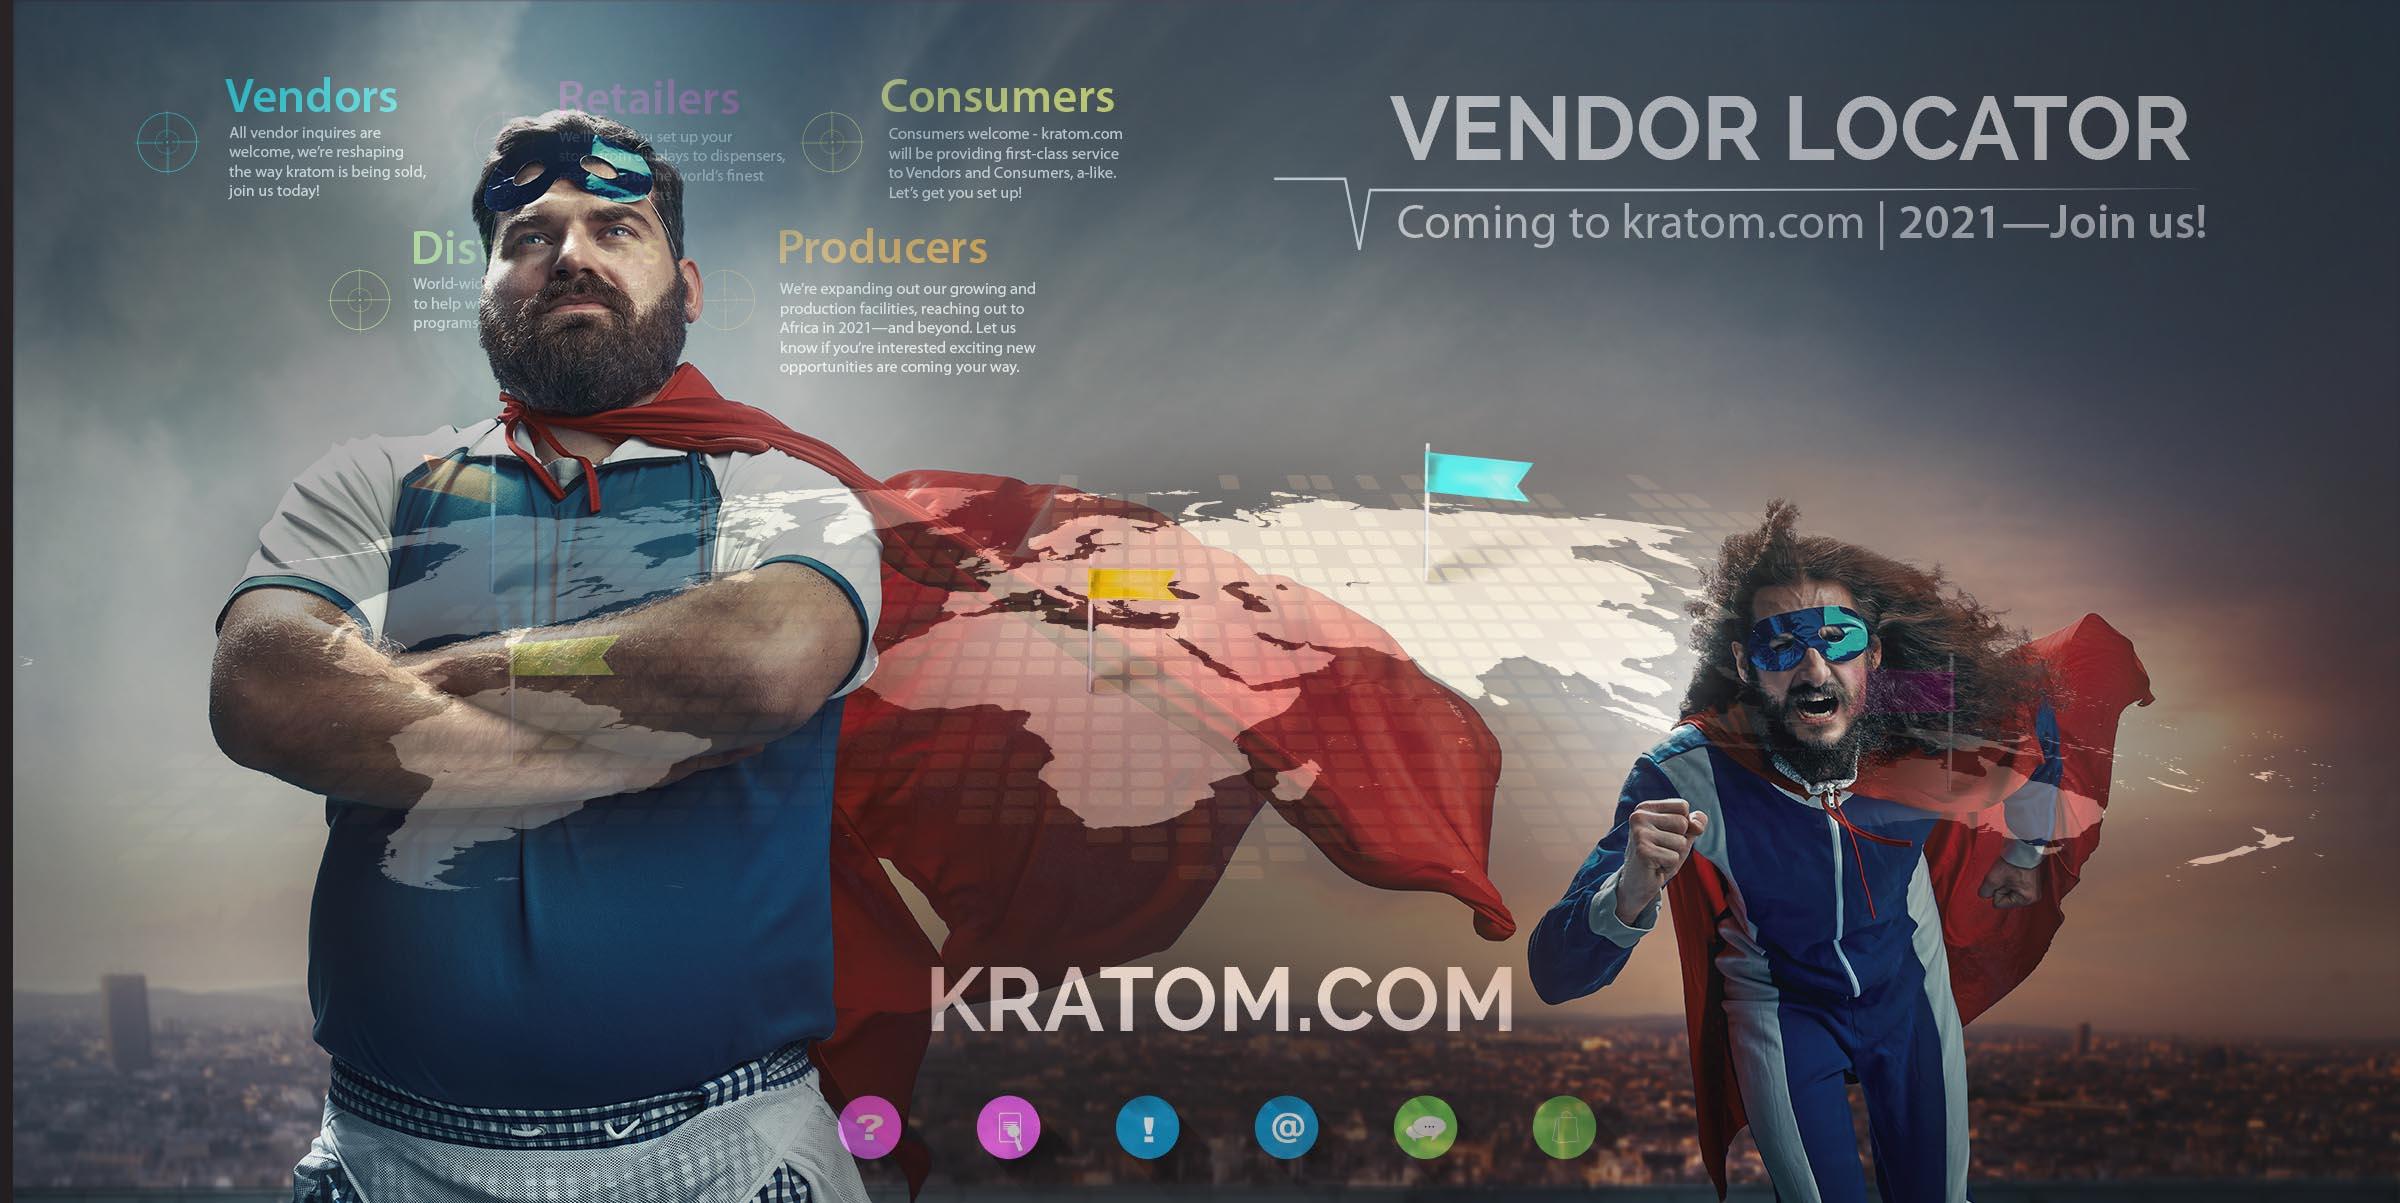 Coming soon! Kratom Vendor Locator - find a local kratom vendor in your area!